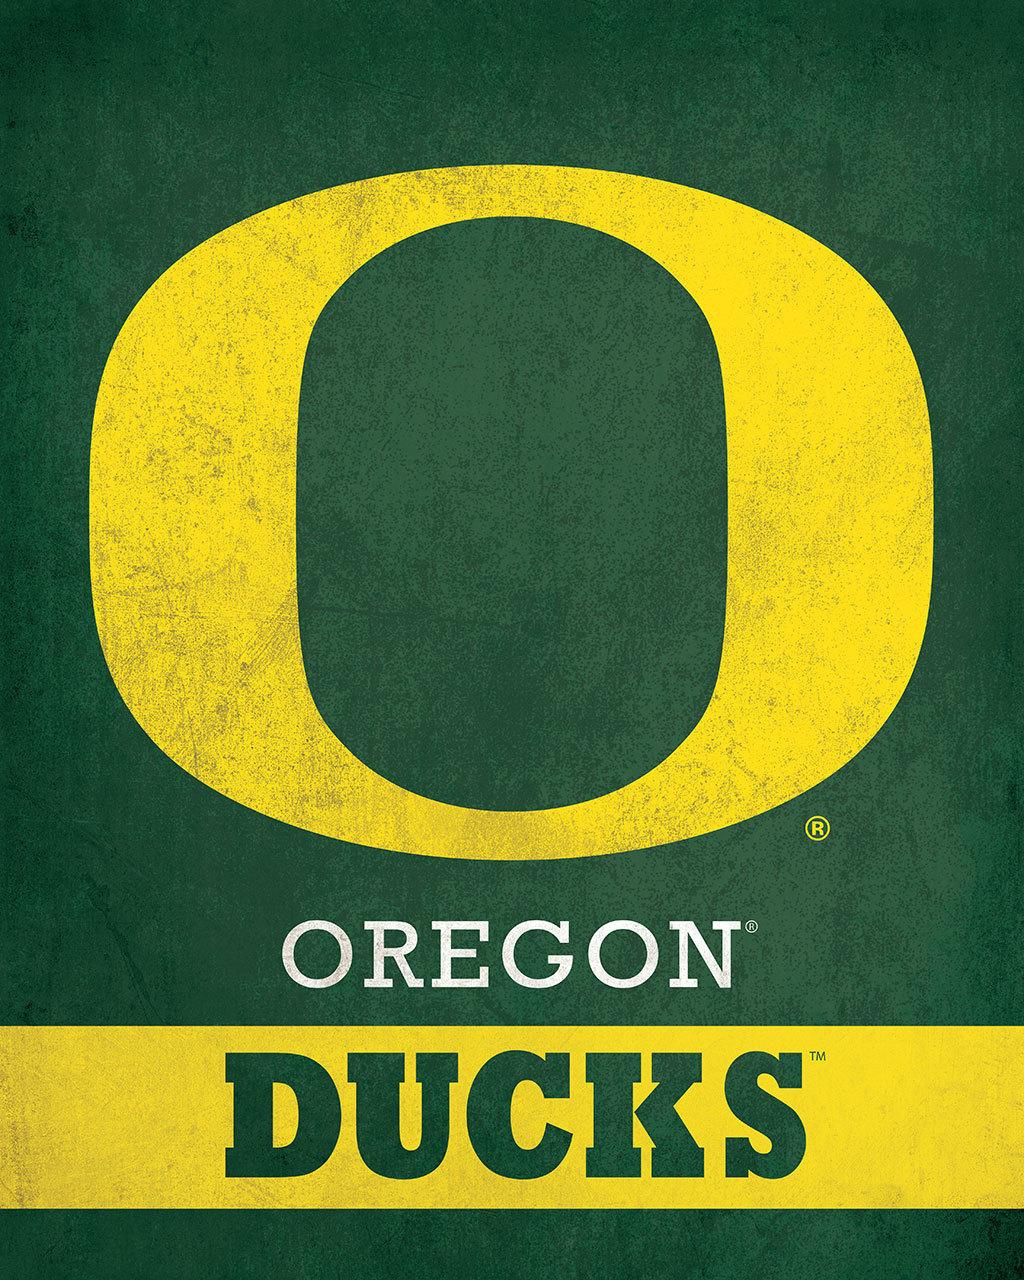 oregon ducks logo.jpg